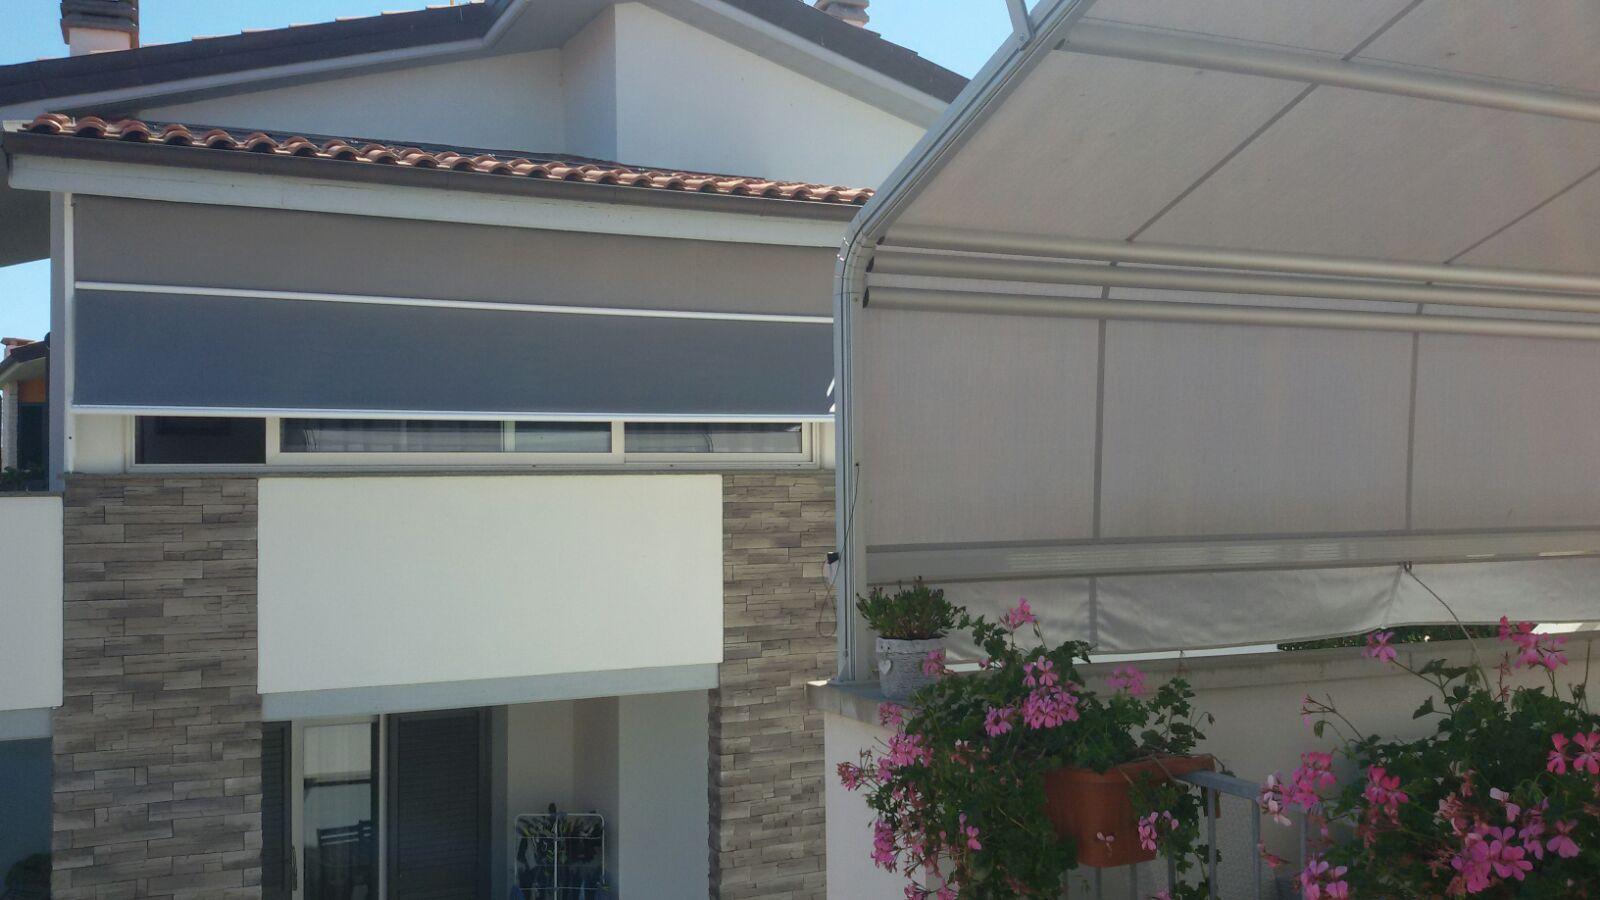 copertura esterna per terrazza | Strutture per Esterni | Pinterest